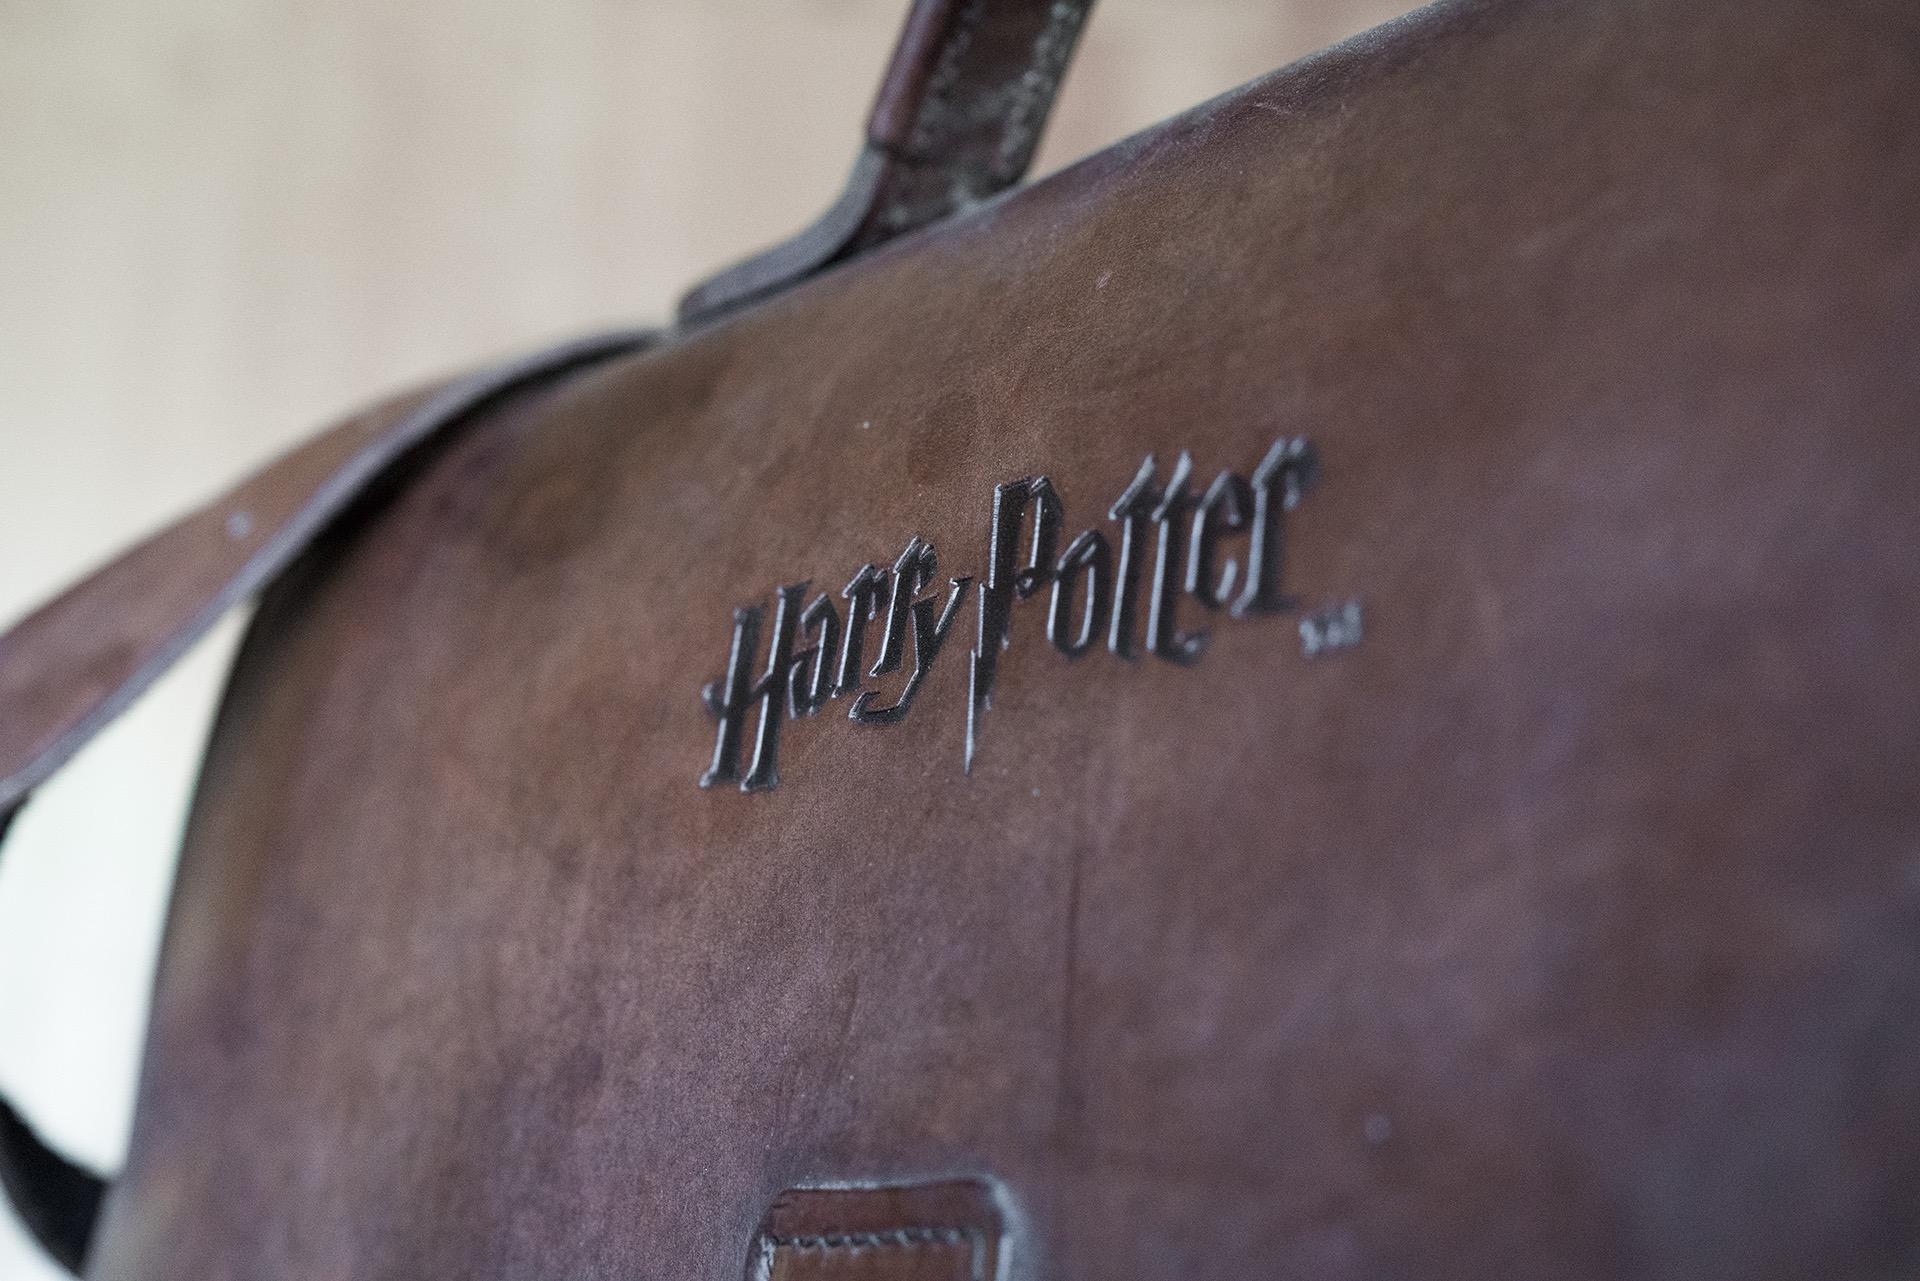 Harry Potter logo in leather satchel.